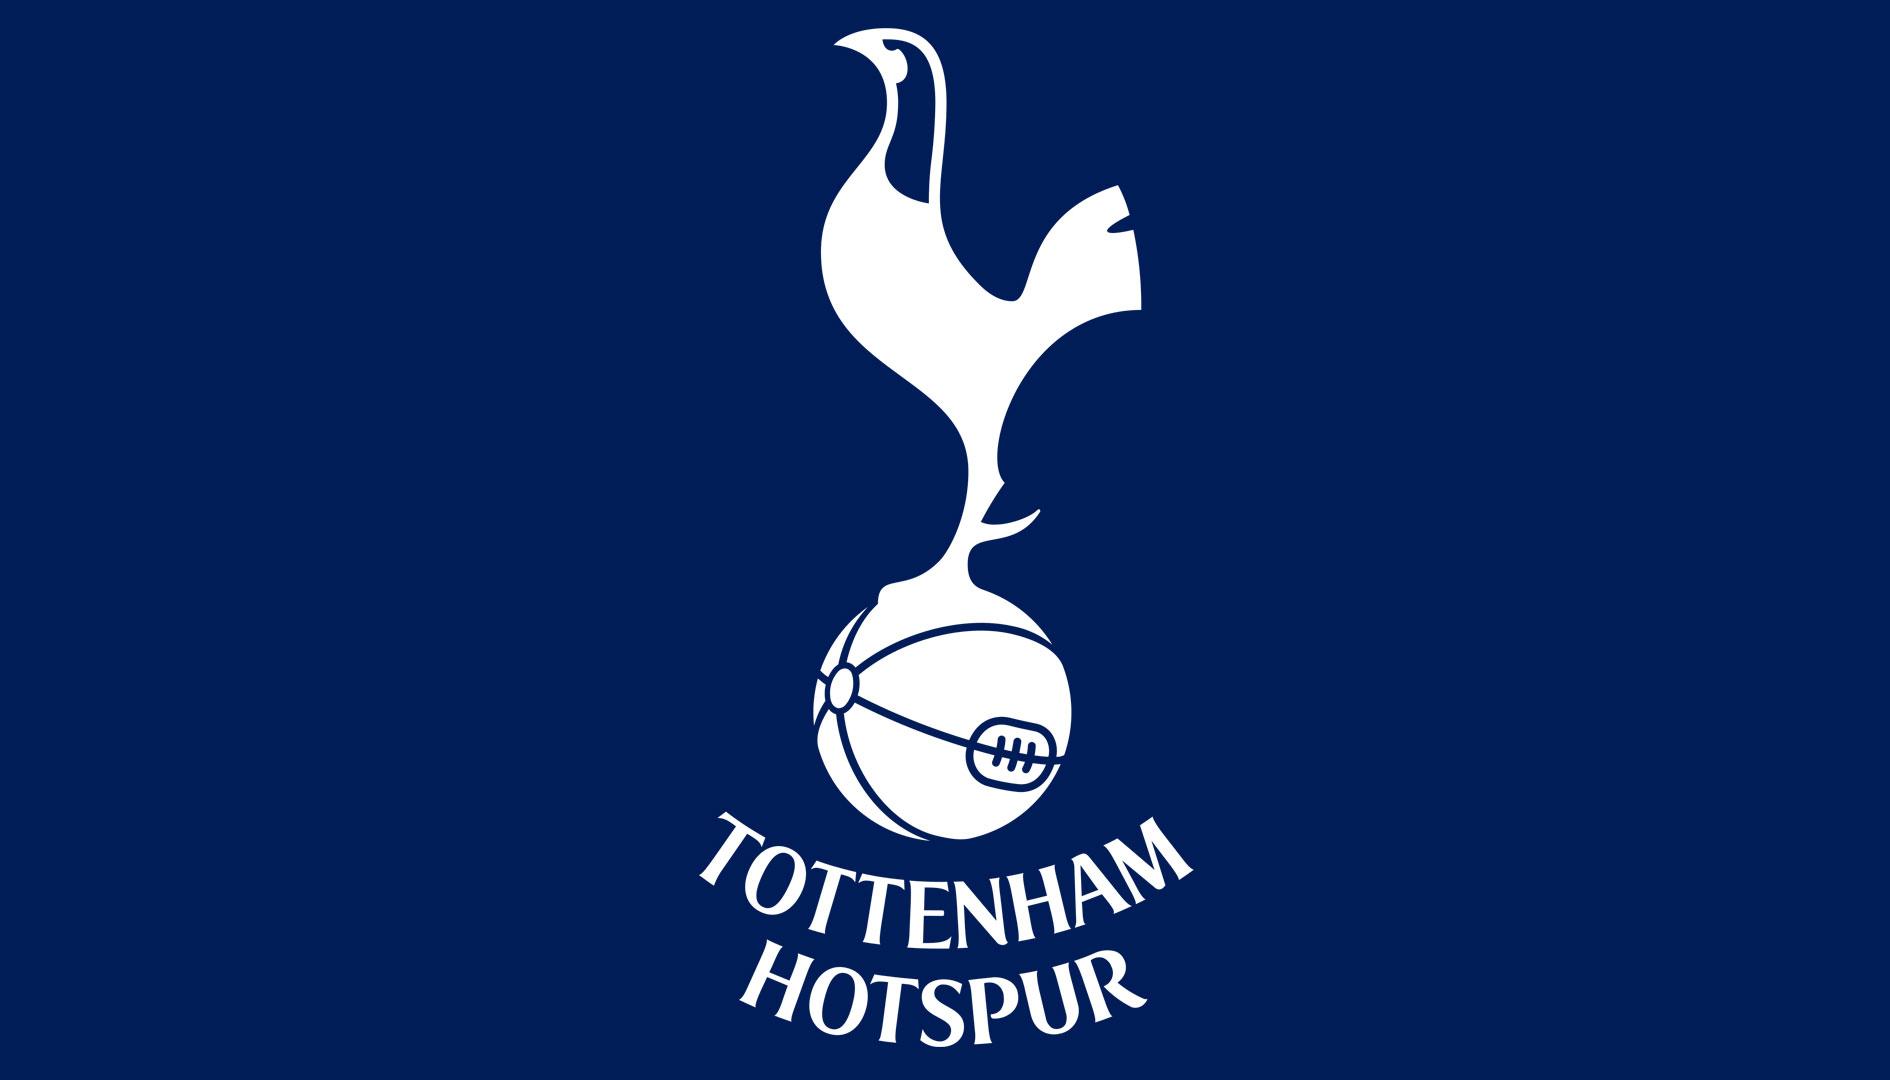 London Uk The Tottenham Hotspur Stadium Sport Impianti Sport E Impianti